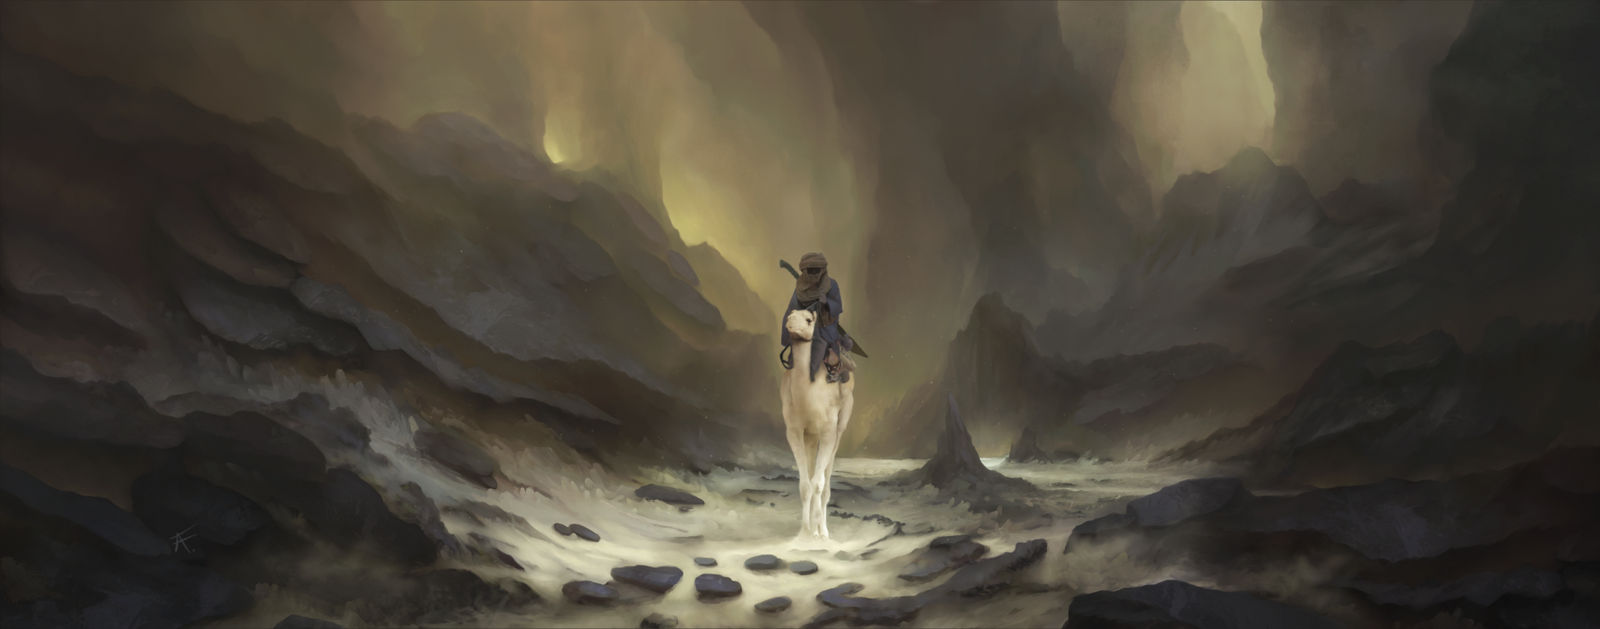 The Wanderer by Anfedart